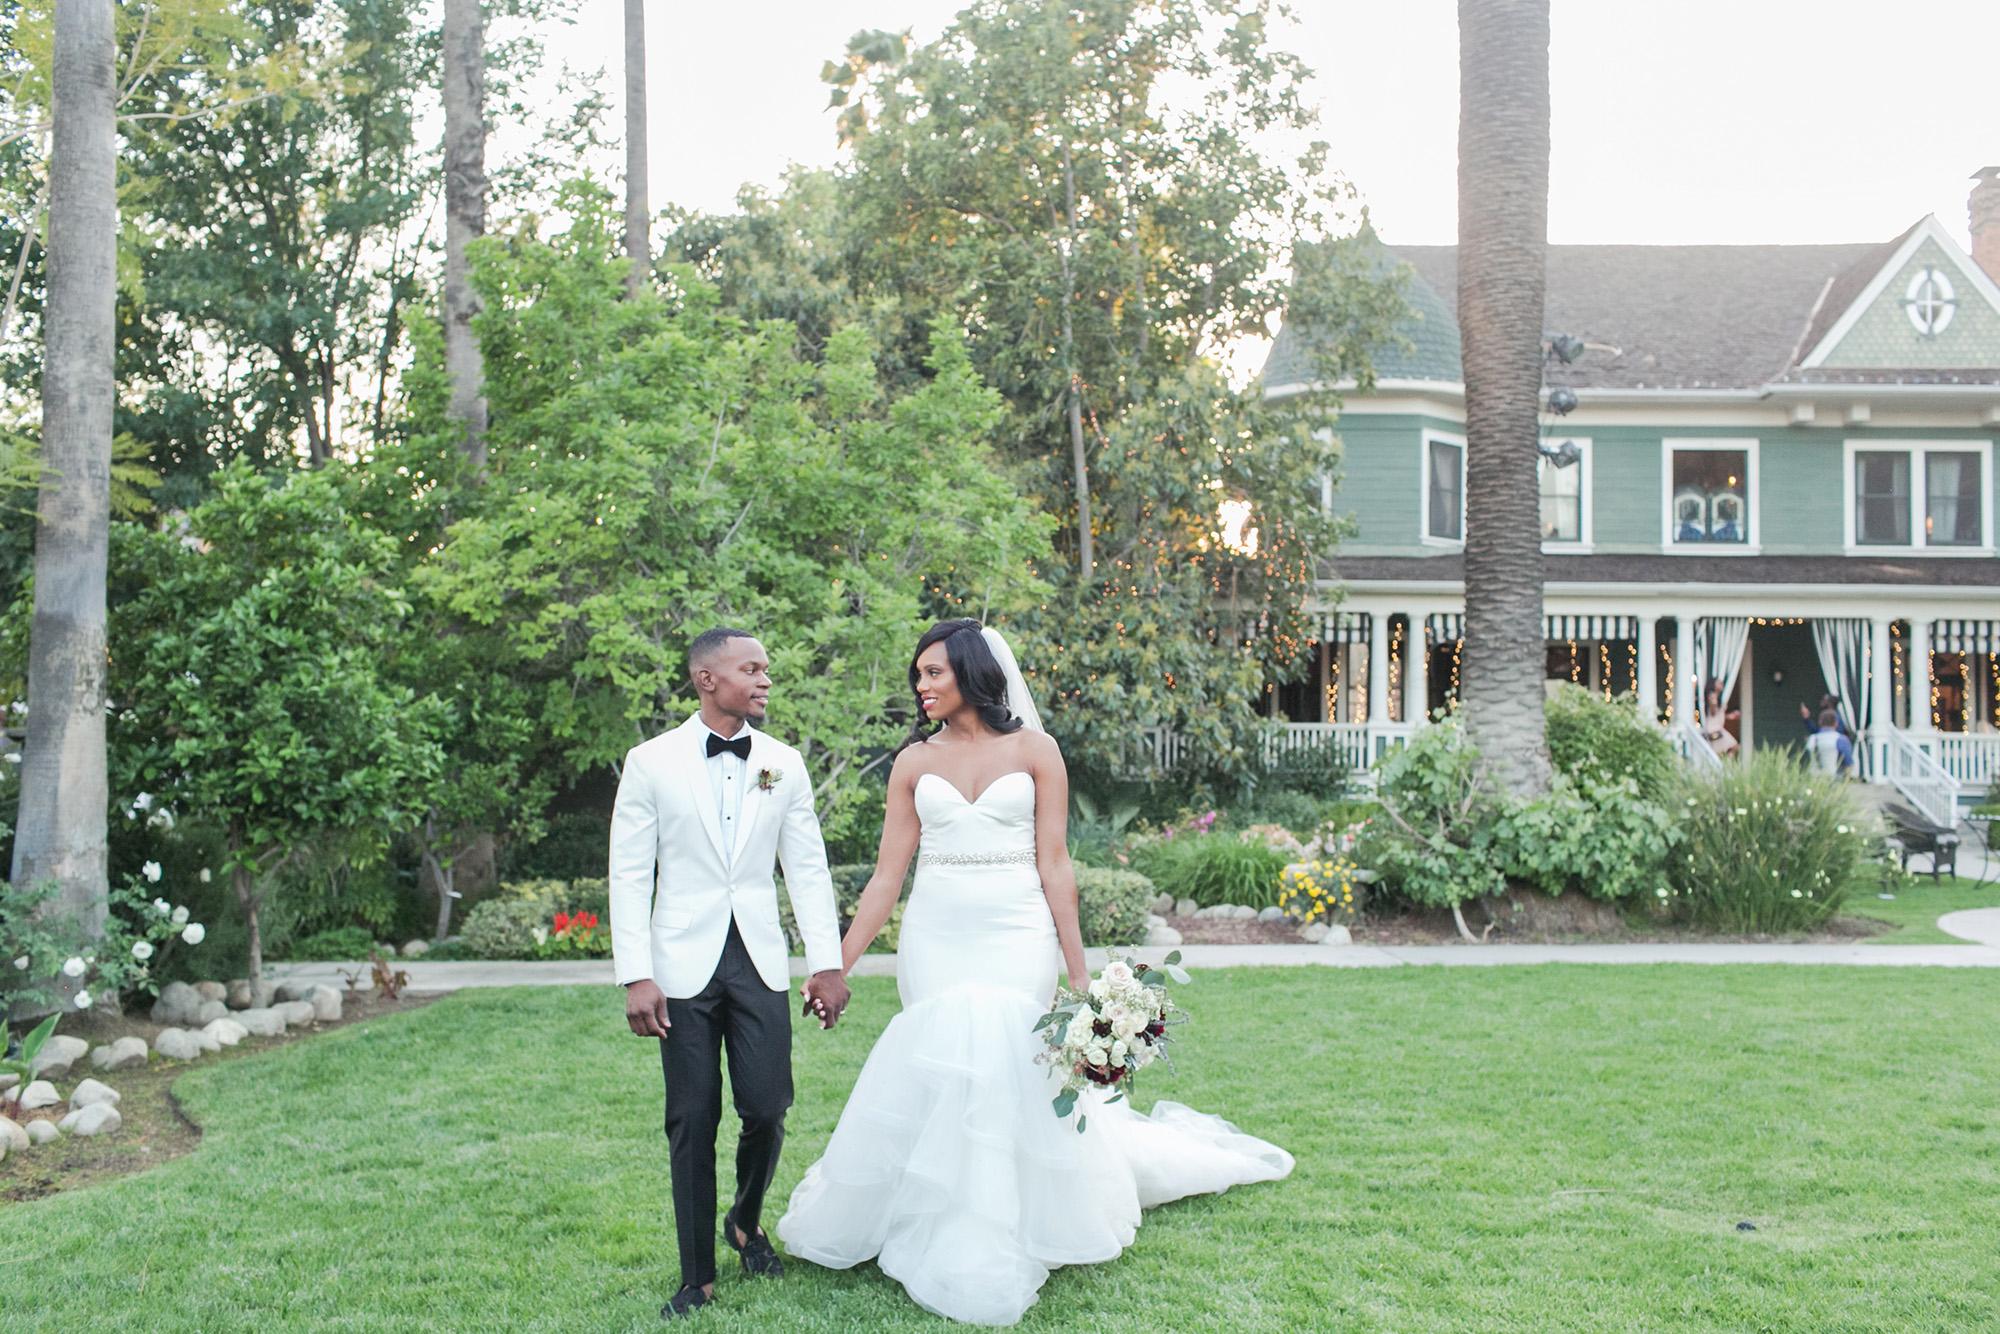 associate-photographer-christmas-house-wedding-carrie-vines-0149.jpg